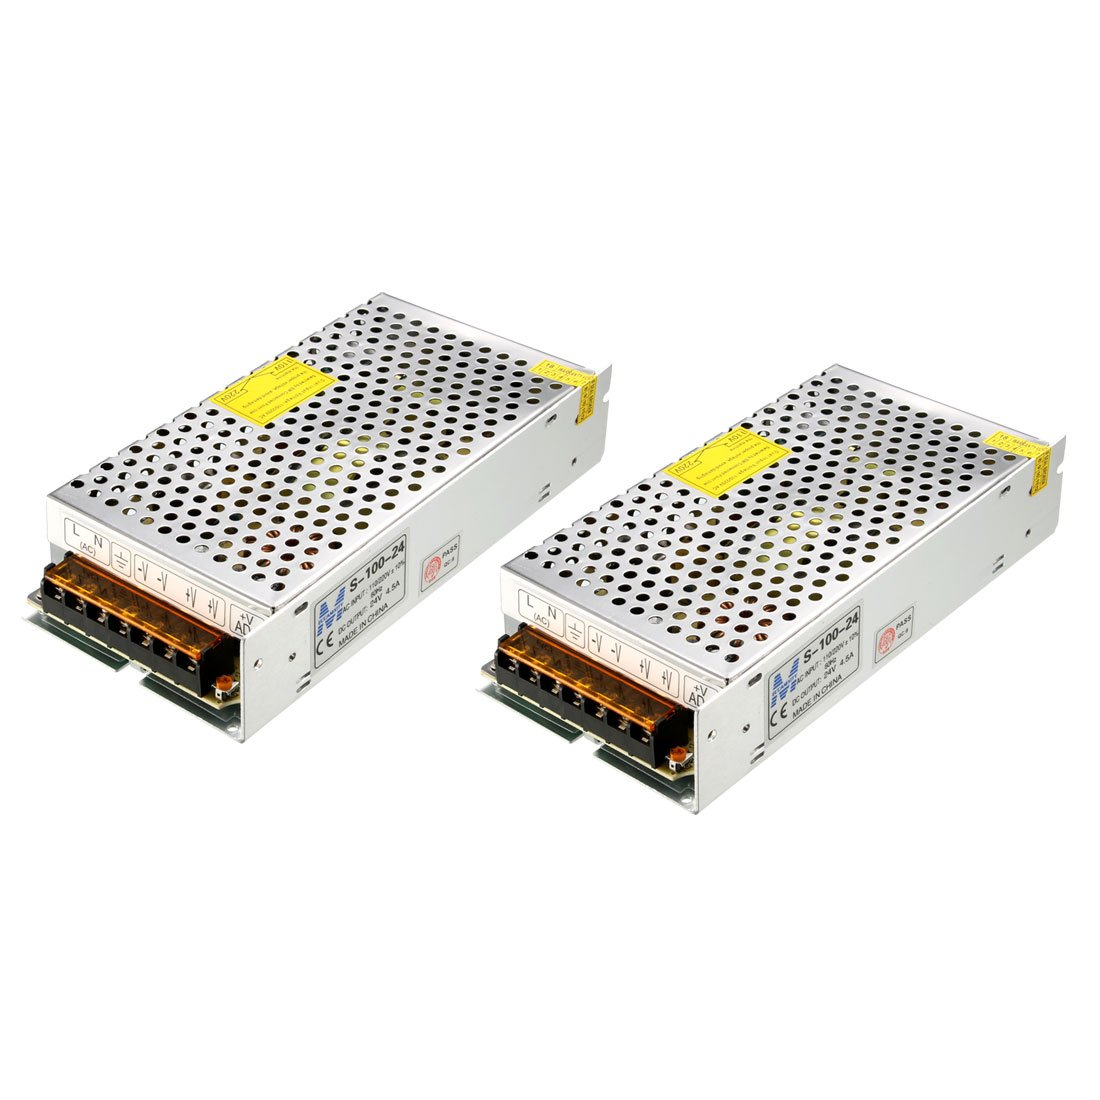 uxcell 2pcs Switch Power Supply Driver S-100-24,AC 110V/220V to DC 24V 4.5A 100W for LED Strip Light